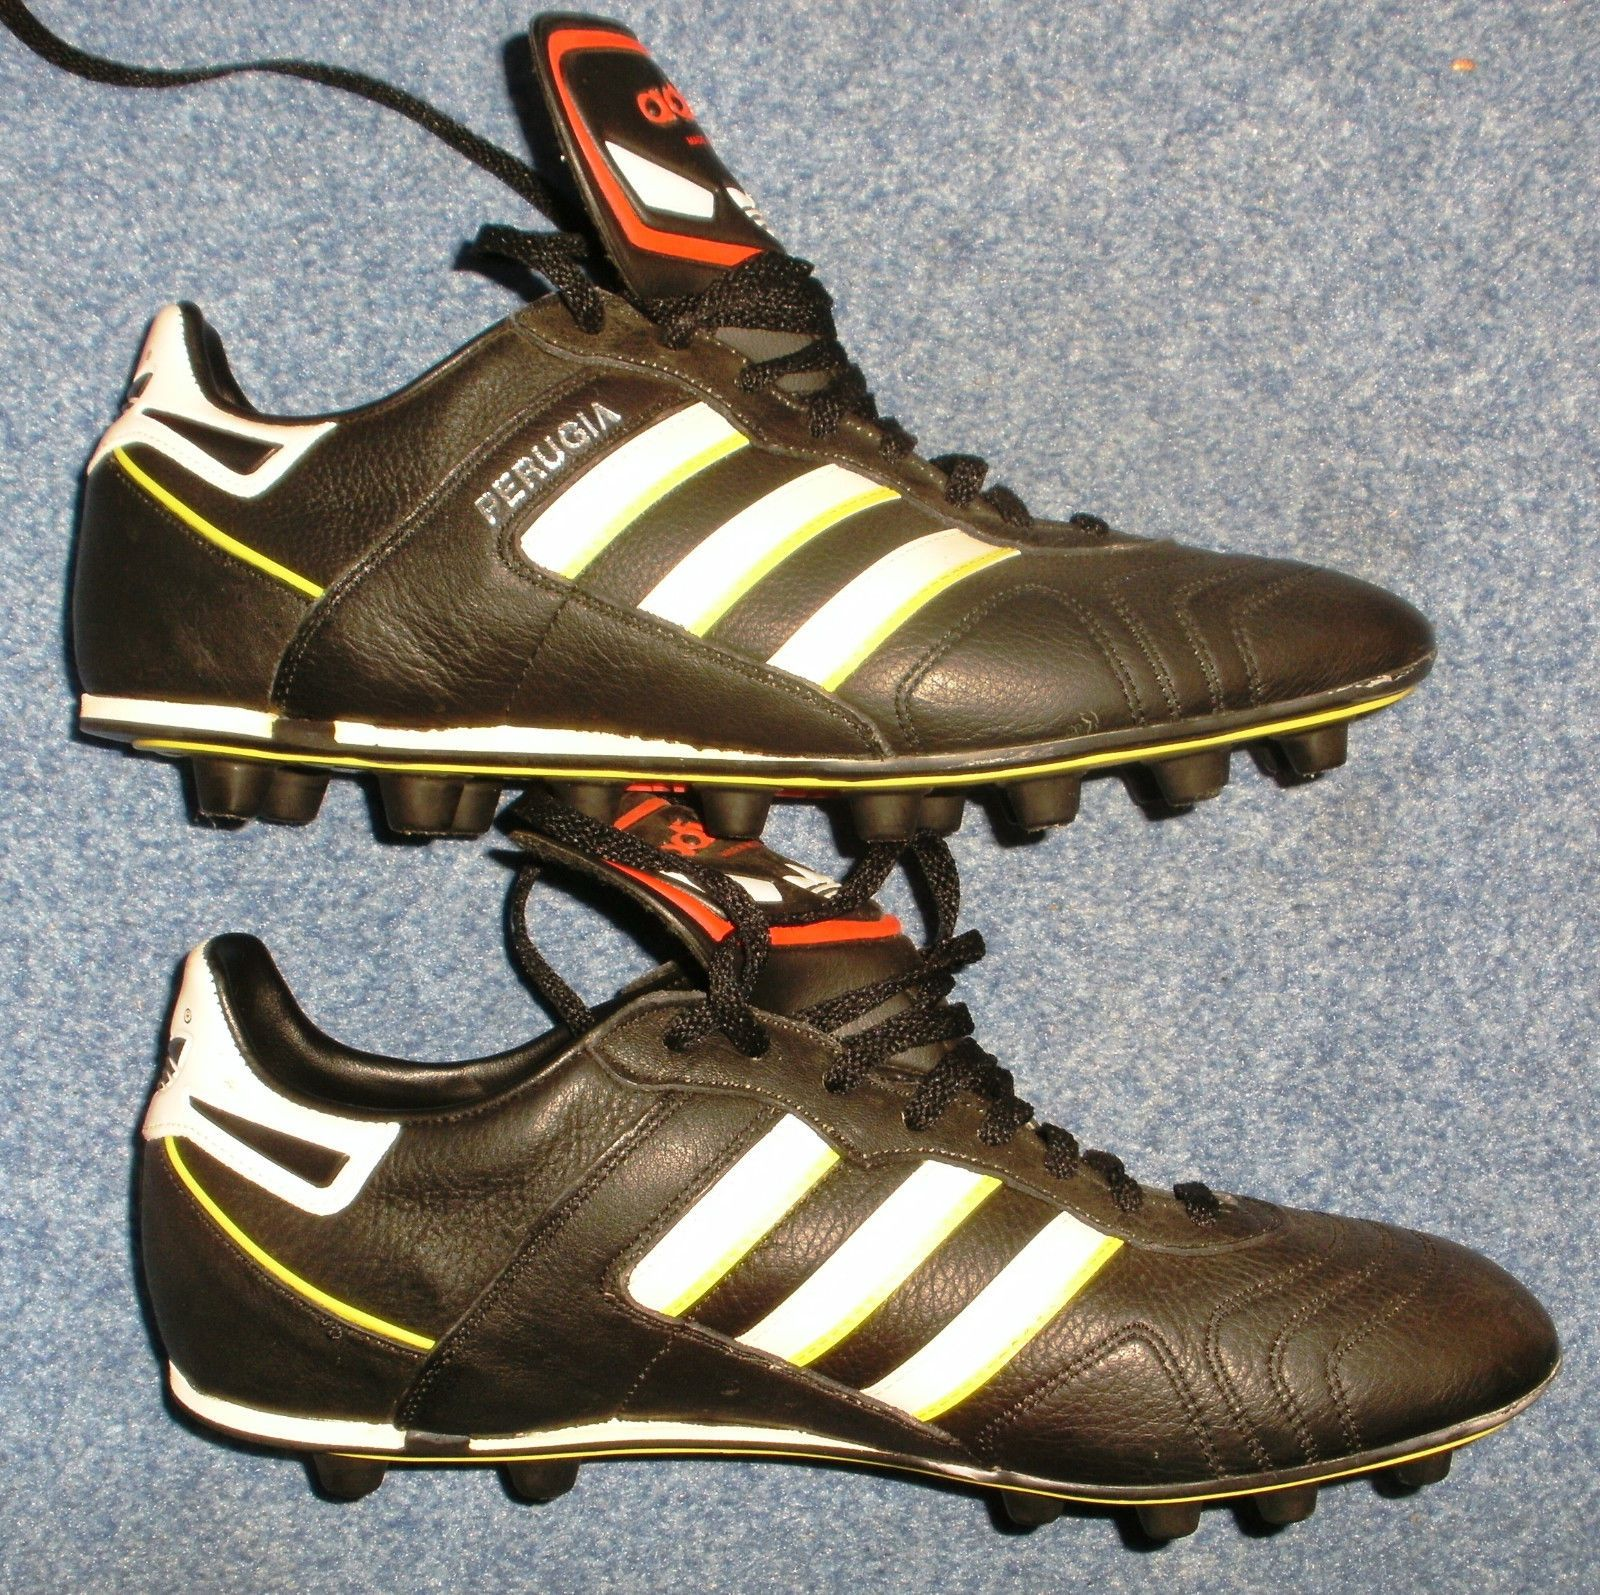 Adidas Sammlerschuhe Perugia Fußballschuhe Fg Wm 1990 Vintage Neu Nnwm8yv0OP